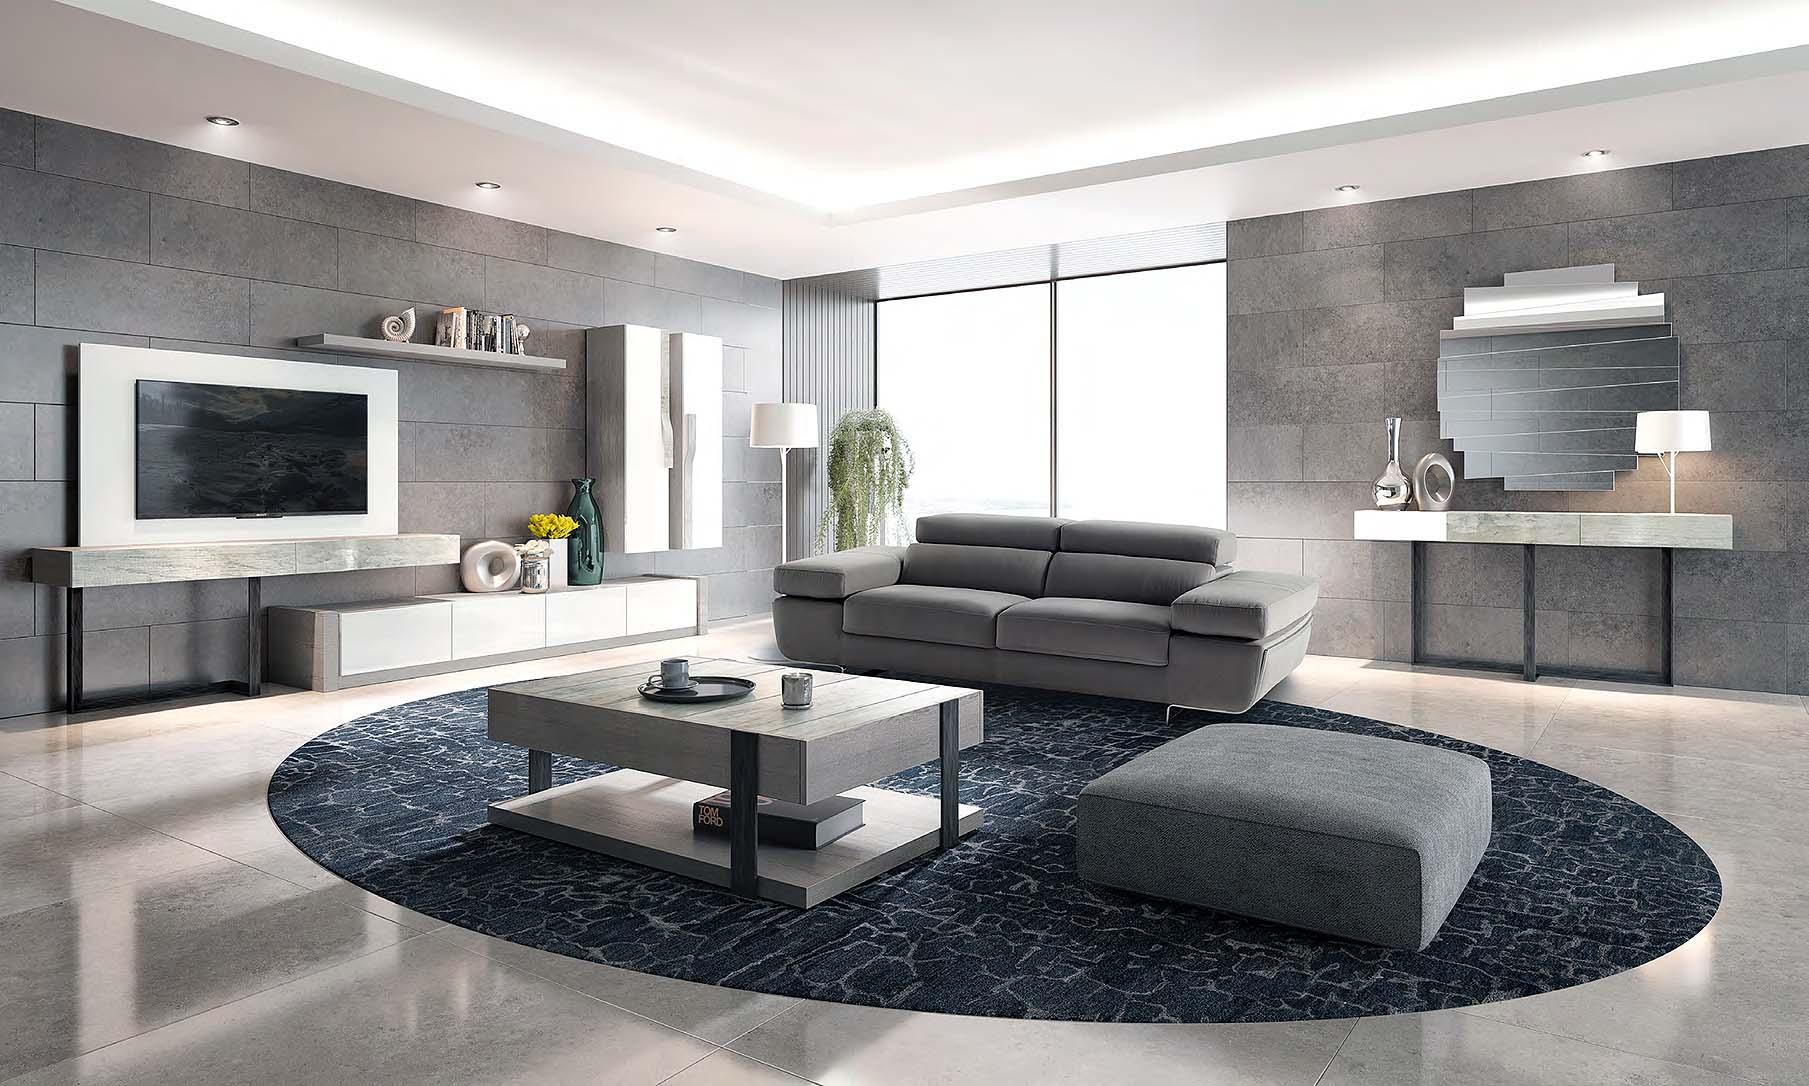 salon-moderno-1623-s1a-casanova